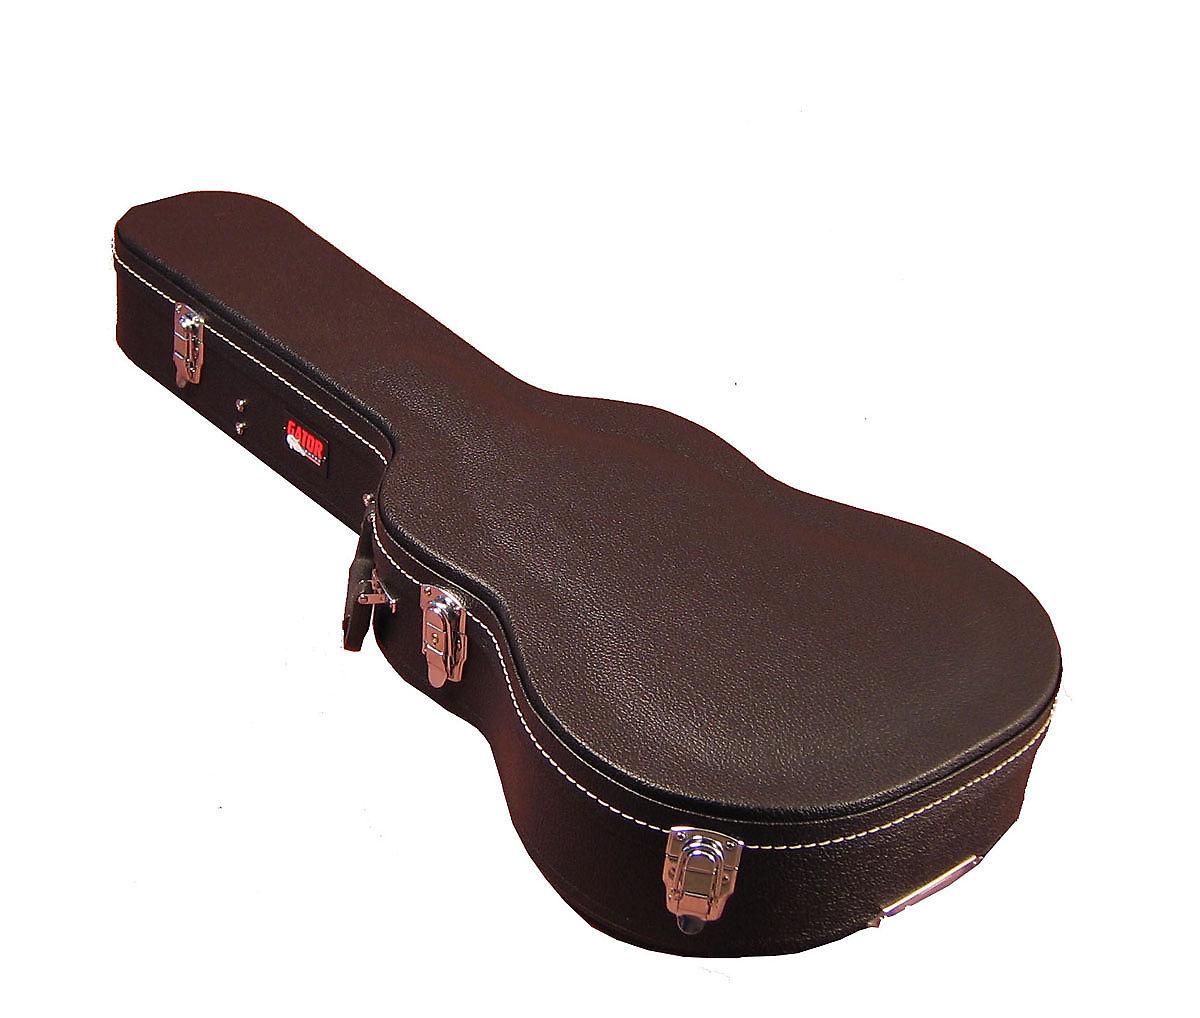 gator gwe acou 3 4 economy wood 3 4 size acoustic guitar case reverb. Black Bedroom Furniture Sets. Home Design Ideas